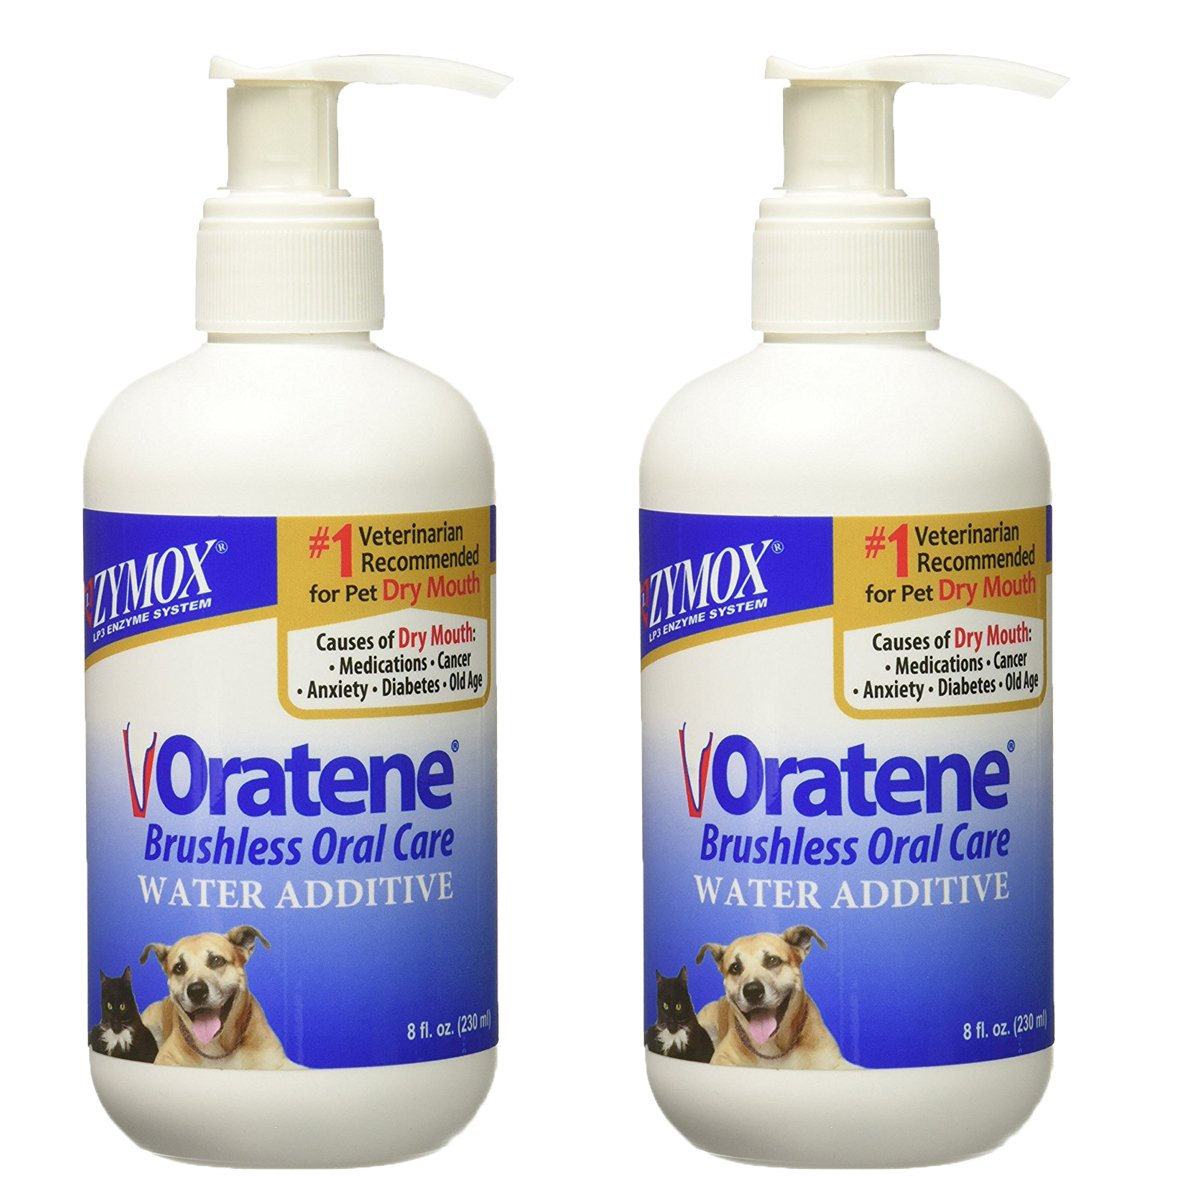 PET KING Oratene Veterinarian Drinking Water Additive, 8.0 oz. (2 Pack)